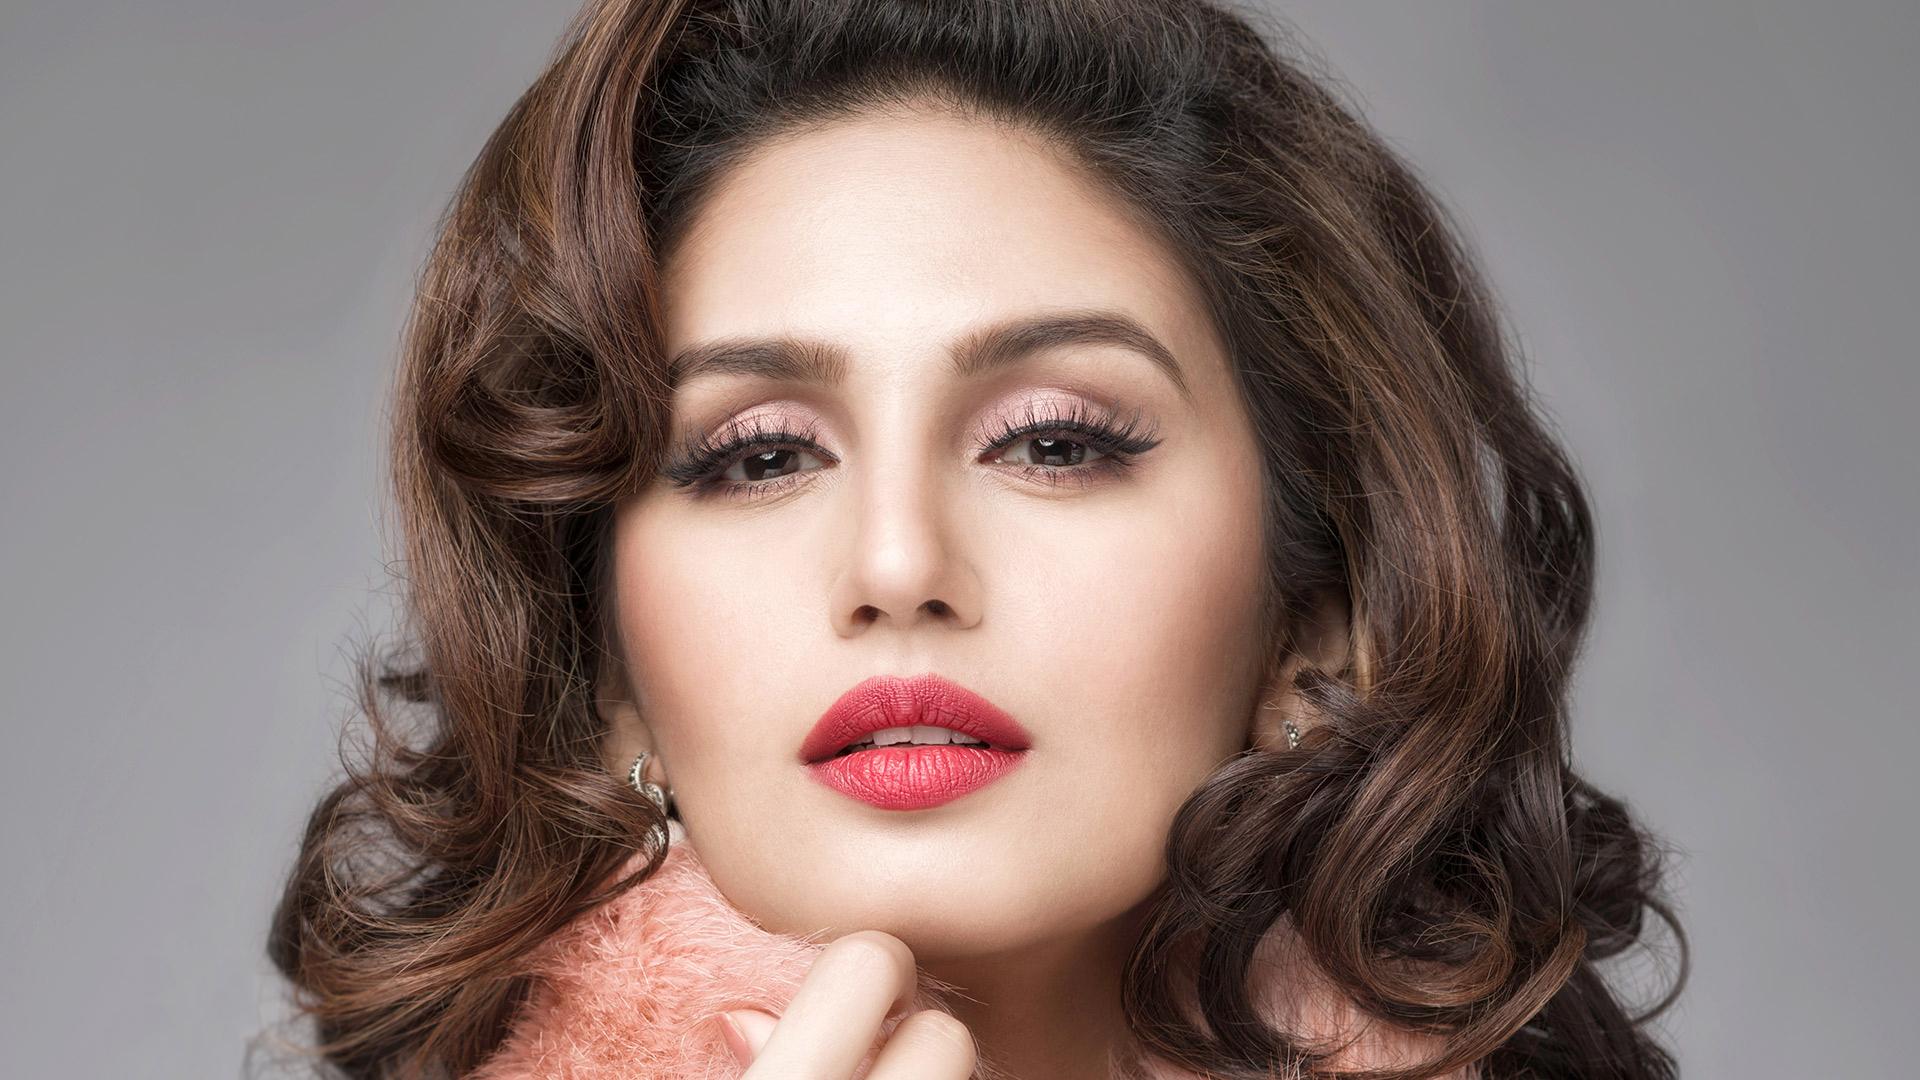 Indian Celebrity Deepika Padukone wallpaper HD 3200x1800